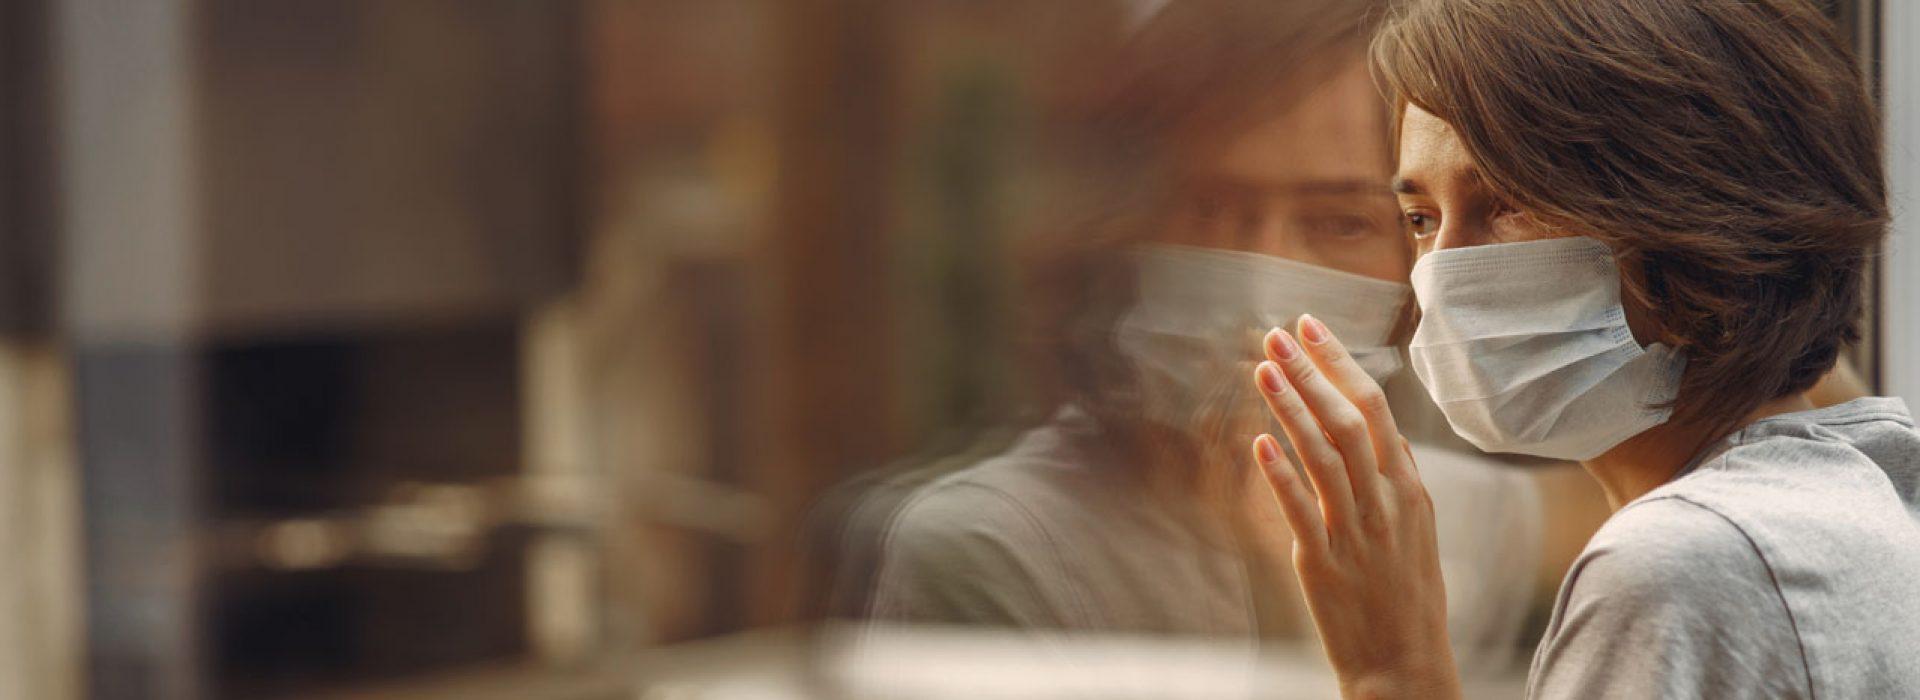 Woman in mask. Coronavirus theme. Lady by the window.